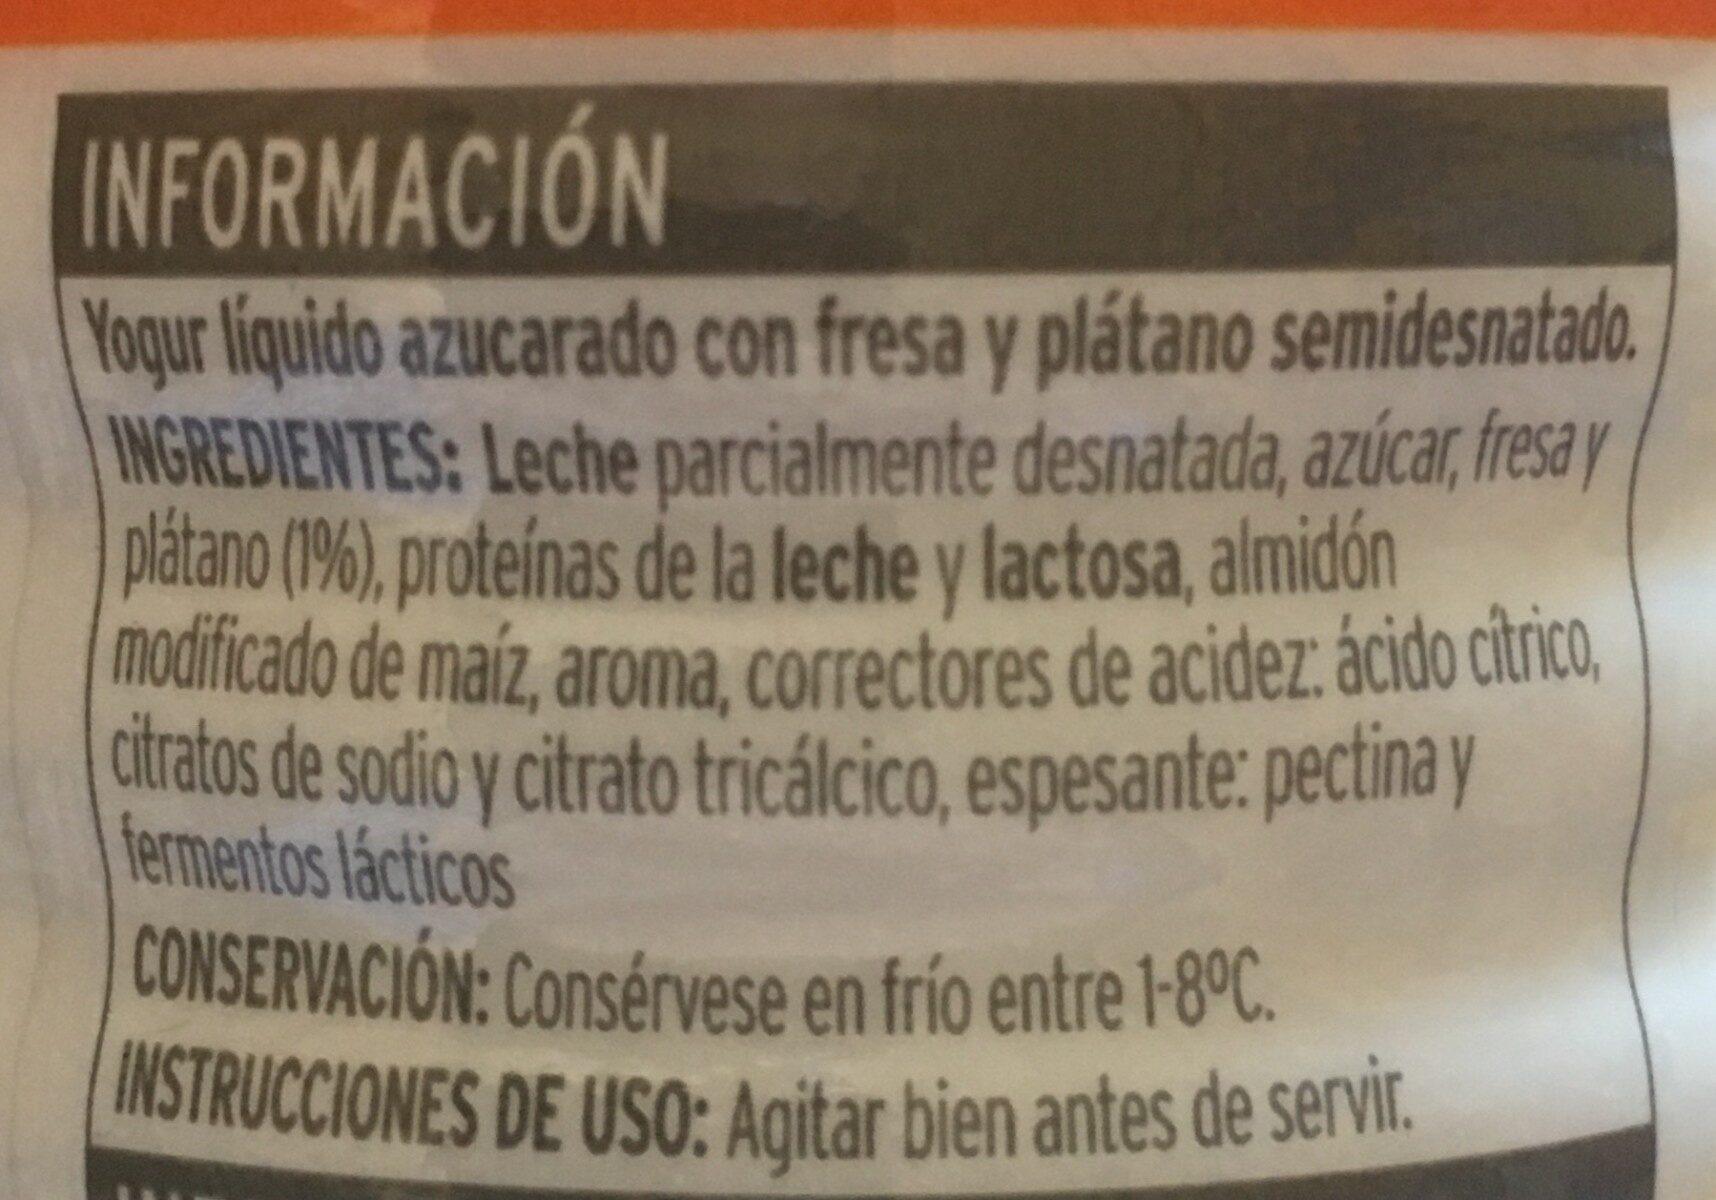 Bon yourt fresa plátano - Ingrédients - es